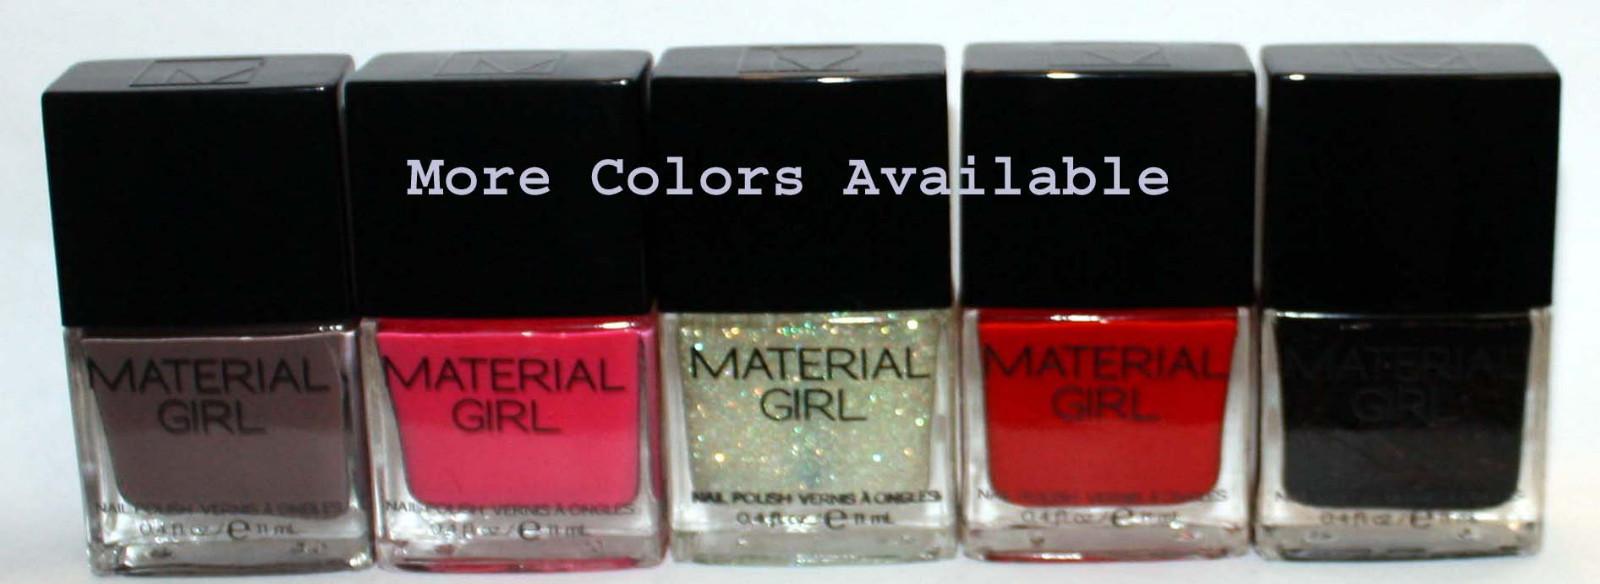 Material Girl Nail Polish Lacquer .4 oz  (Several Colors) *Reduced* 03378